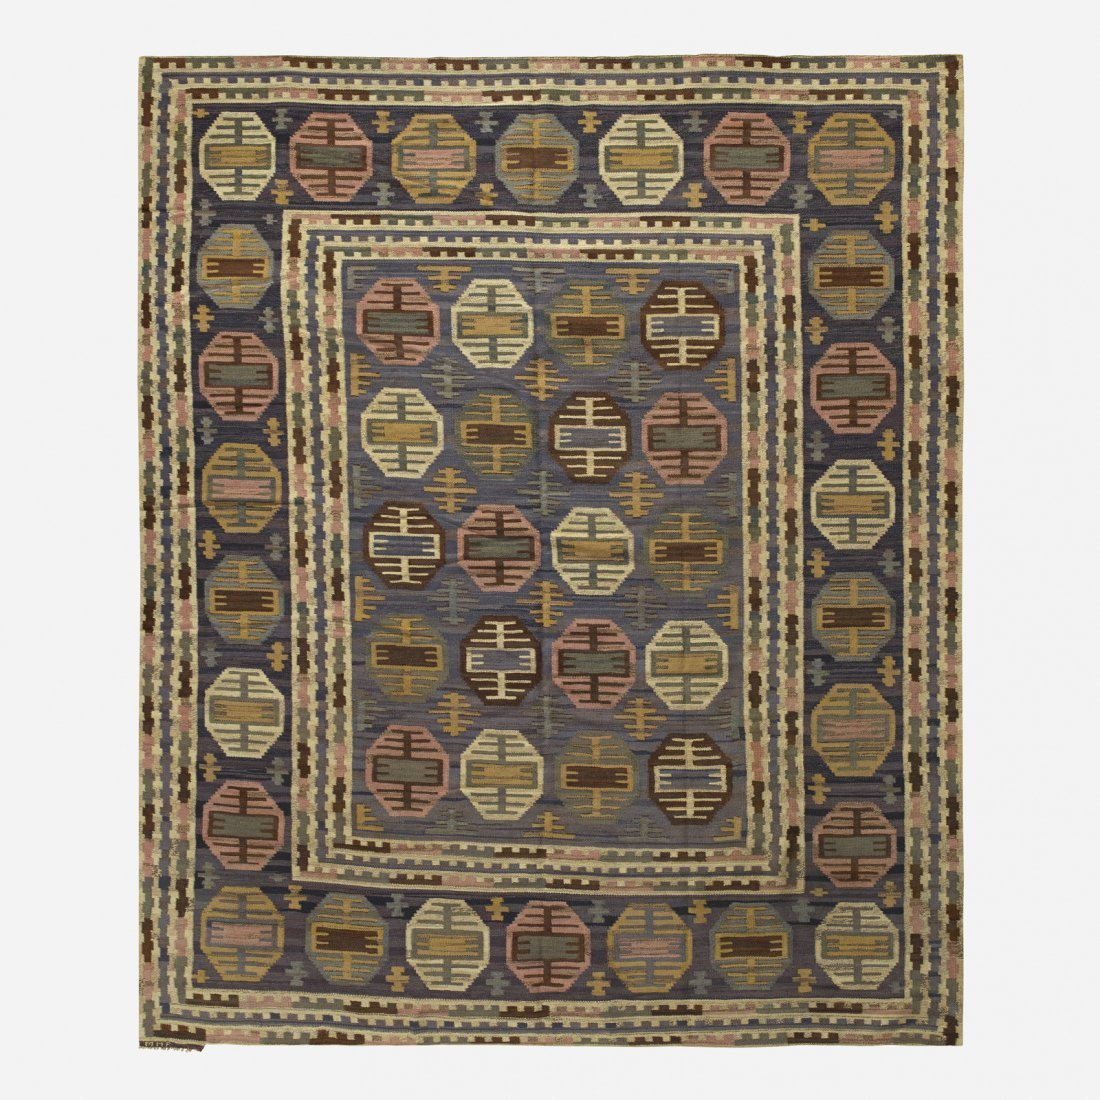 Marta Maas-Fjetterstrom, Dukater flatweave carpet